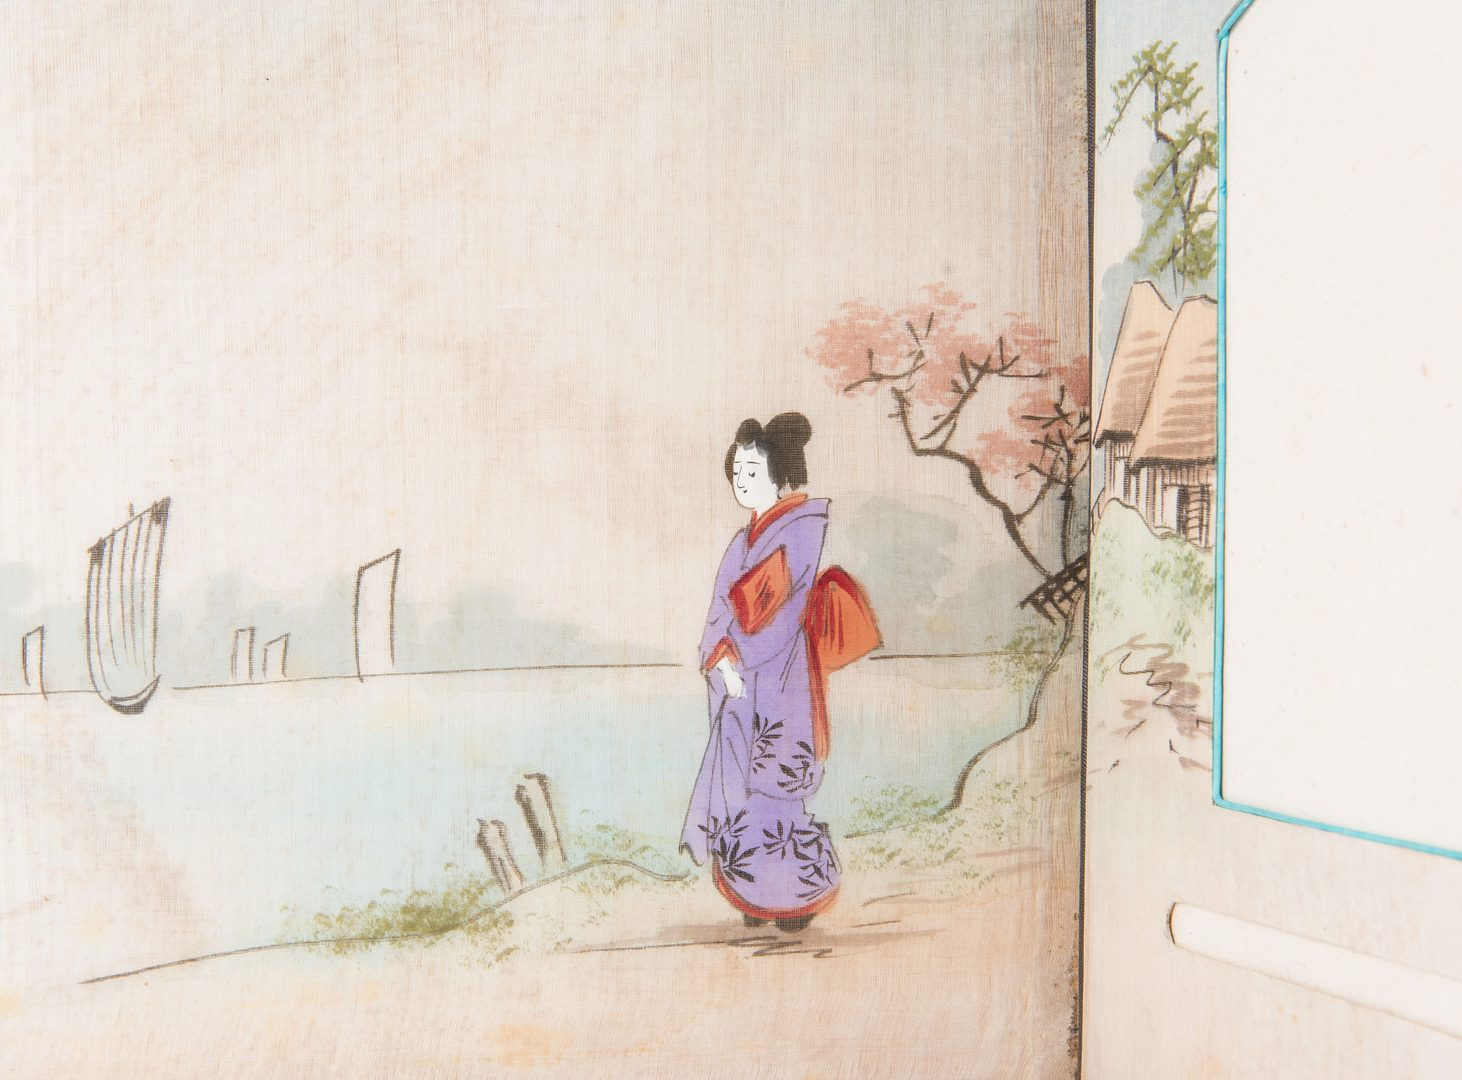 Lot 403: Japanese Lacquer Album & Photographer's Collage